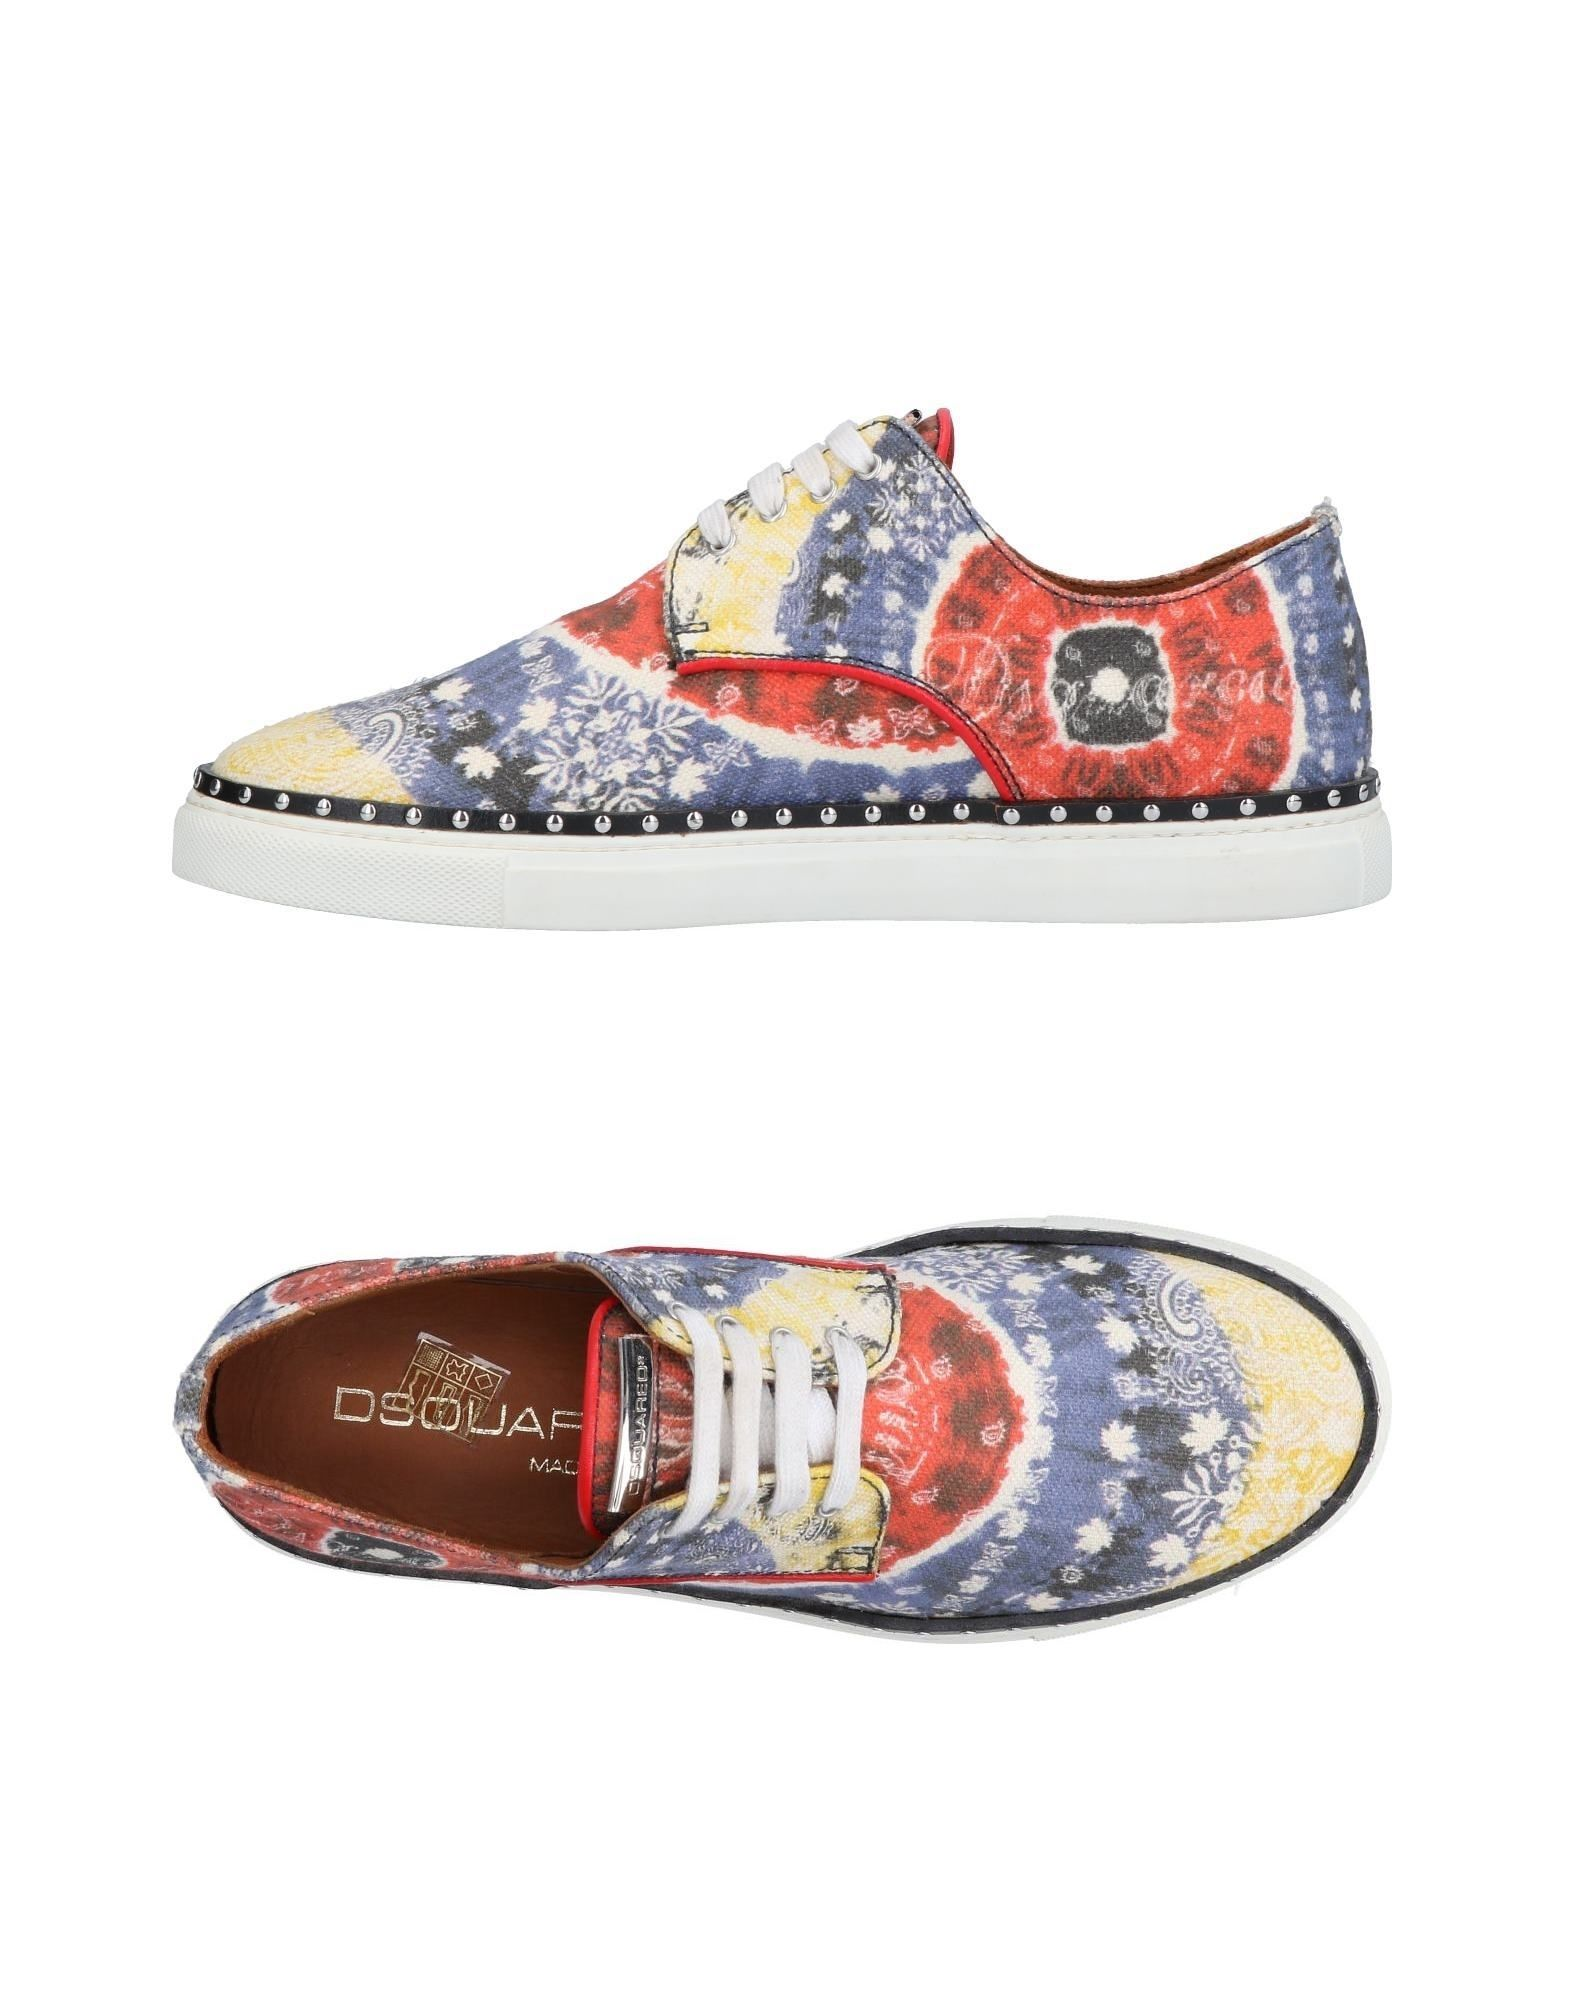 Dsquared2 Sneakers Herren  11470039OH Gute Qualität beliebte Schuhe